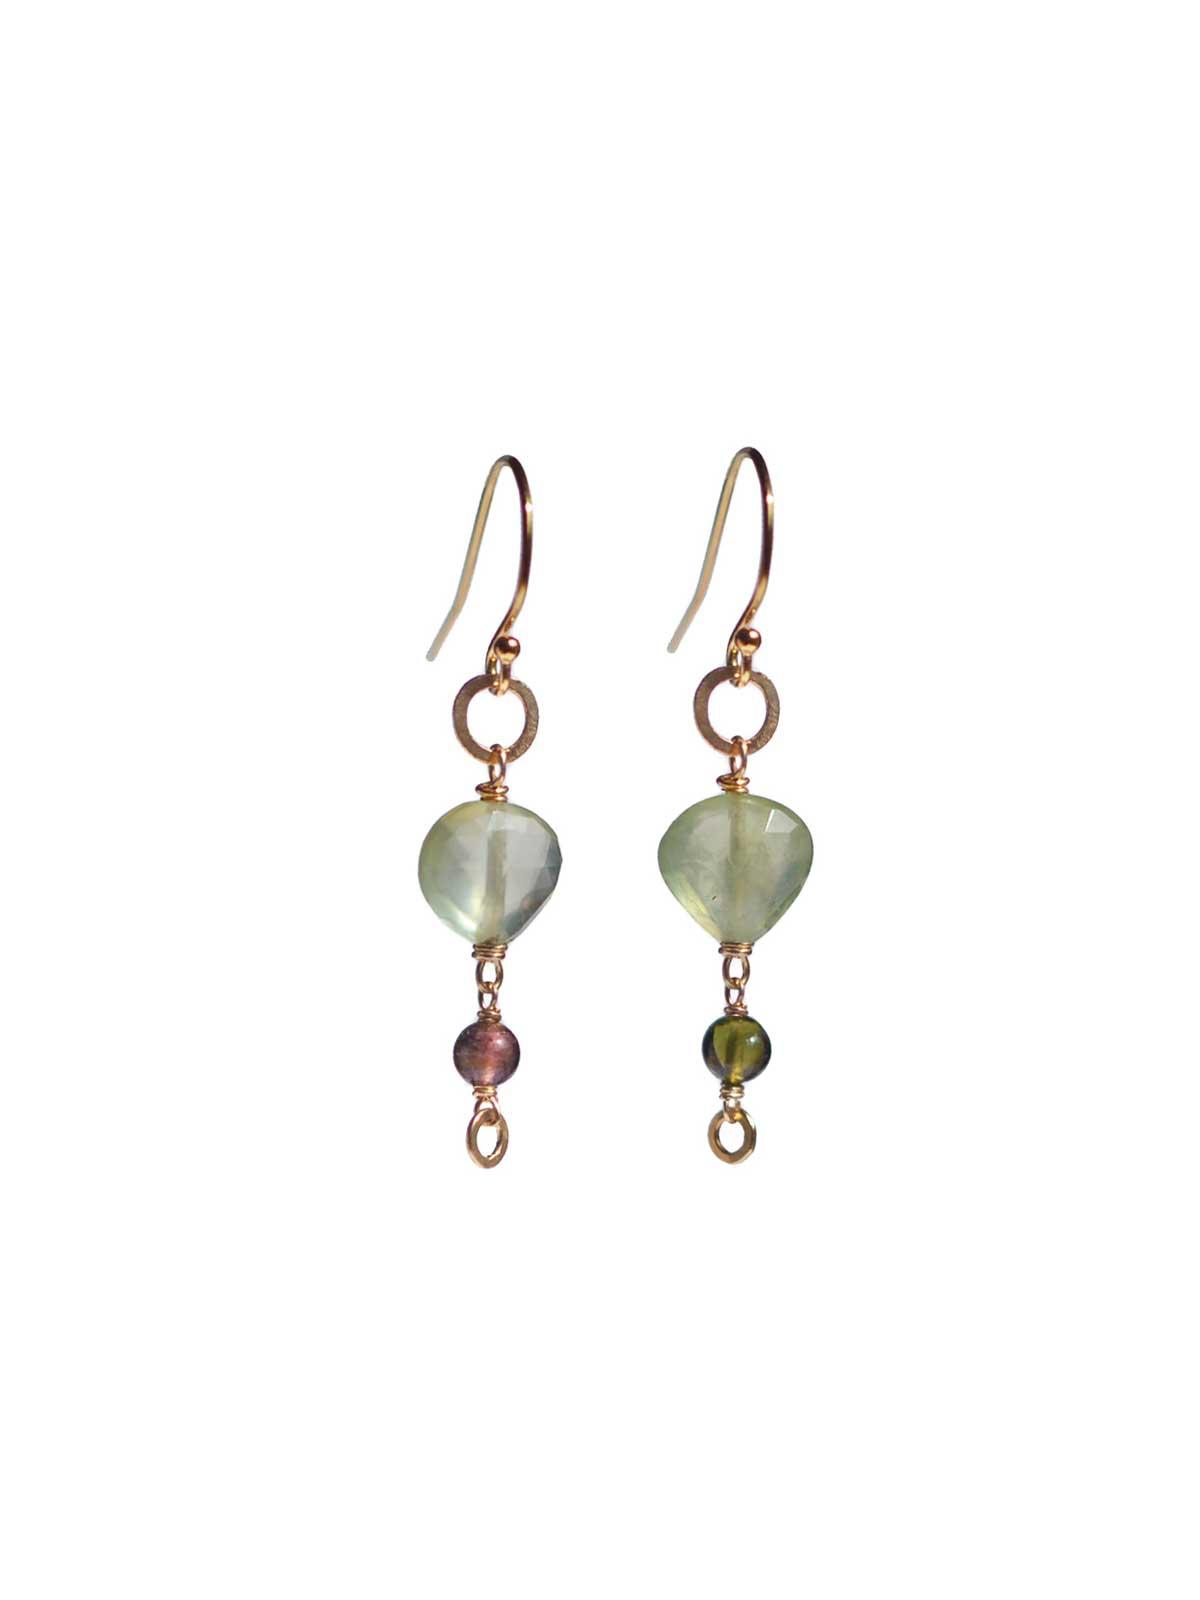 earrings 14K Gold-filled Faceted Prehnite Tourmaline